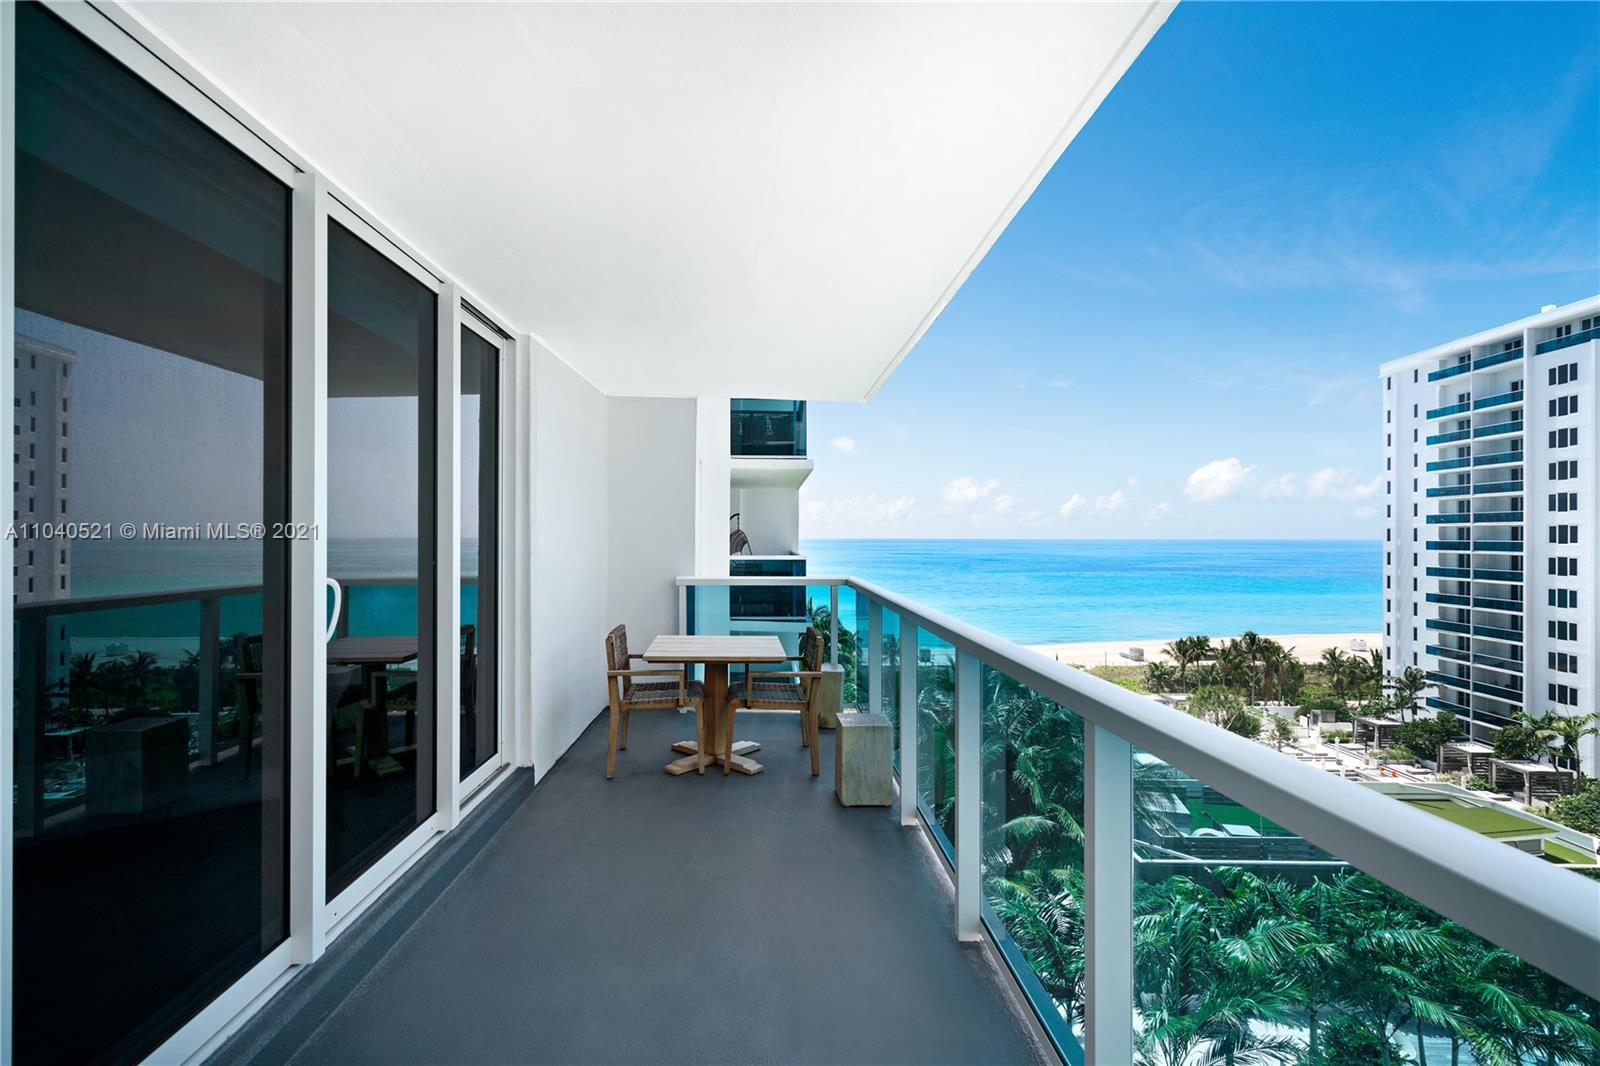 1 Hotel & Homes #1004 - 102 24th St #1004, Miami Beach, FL 33139